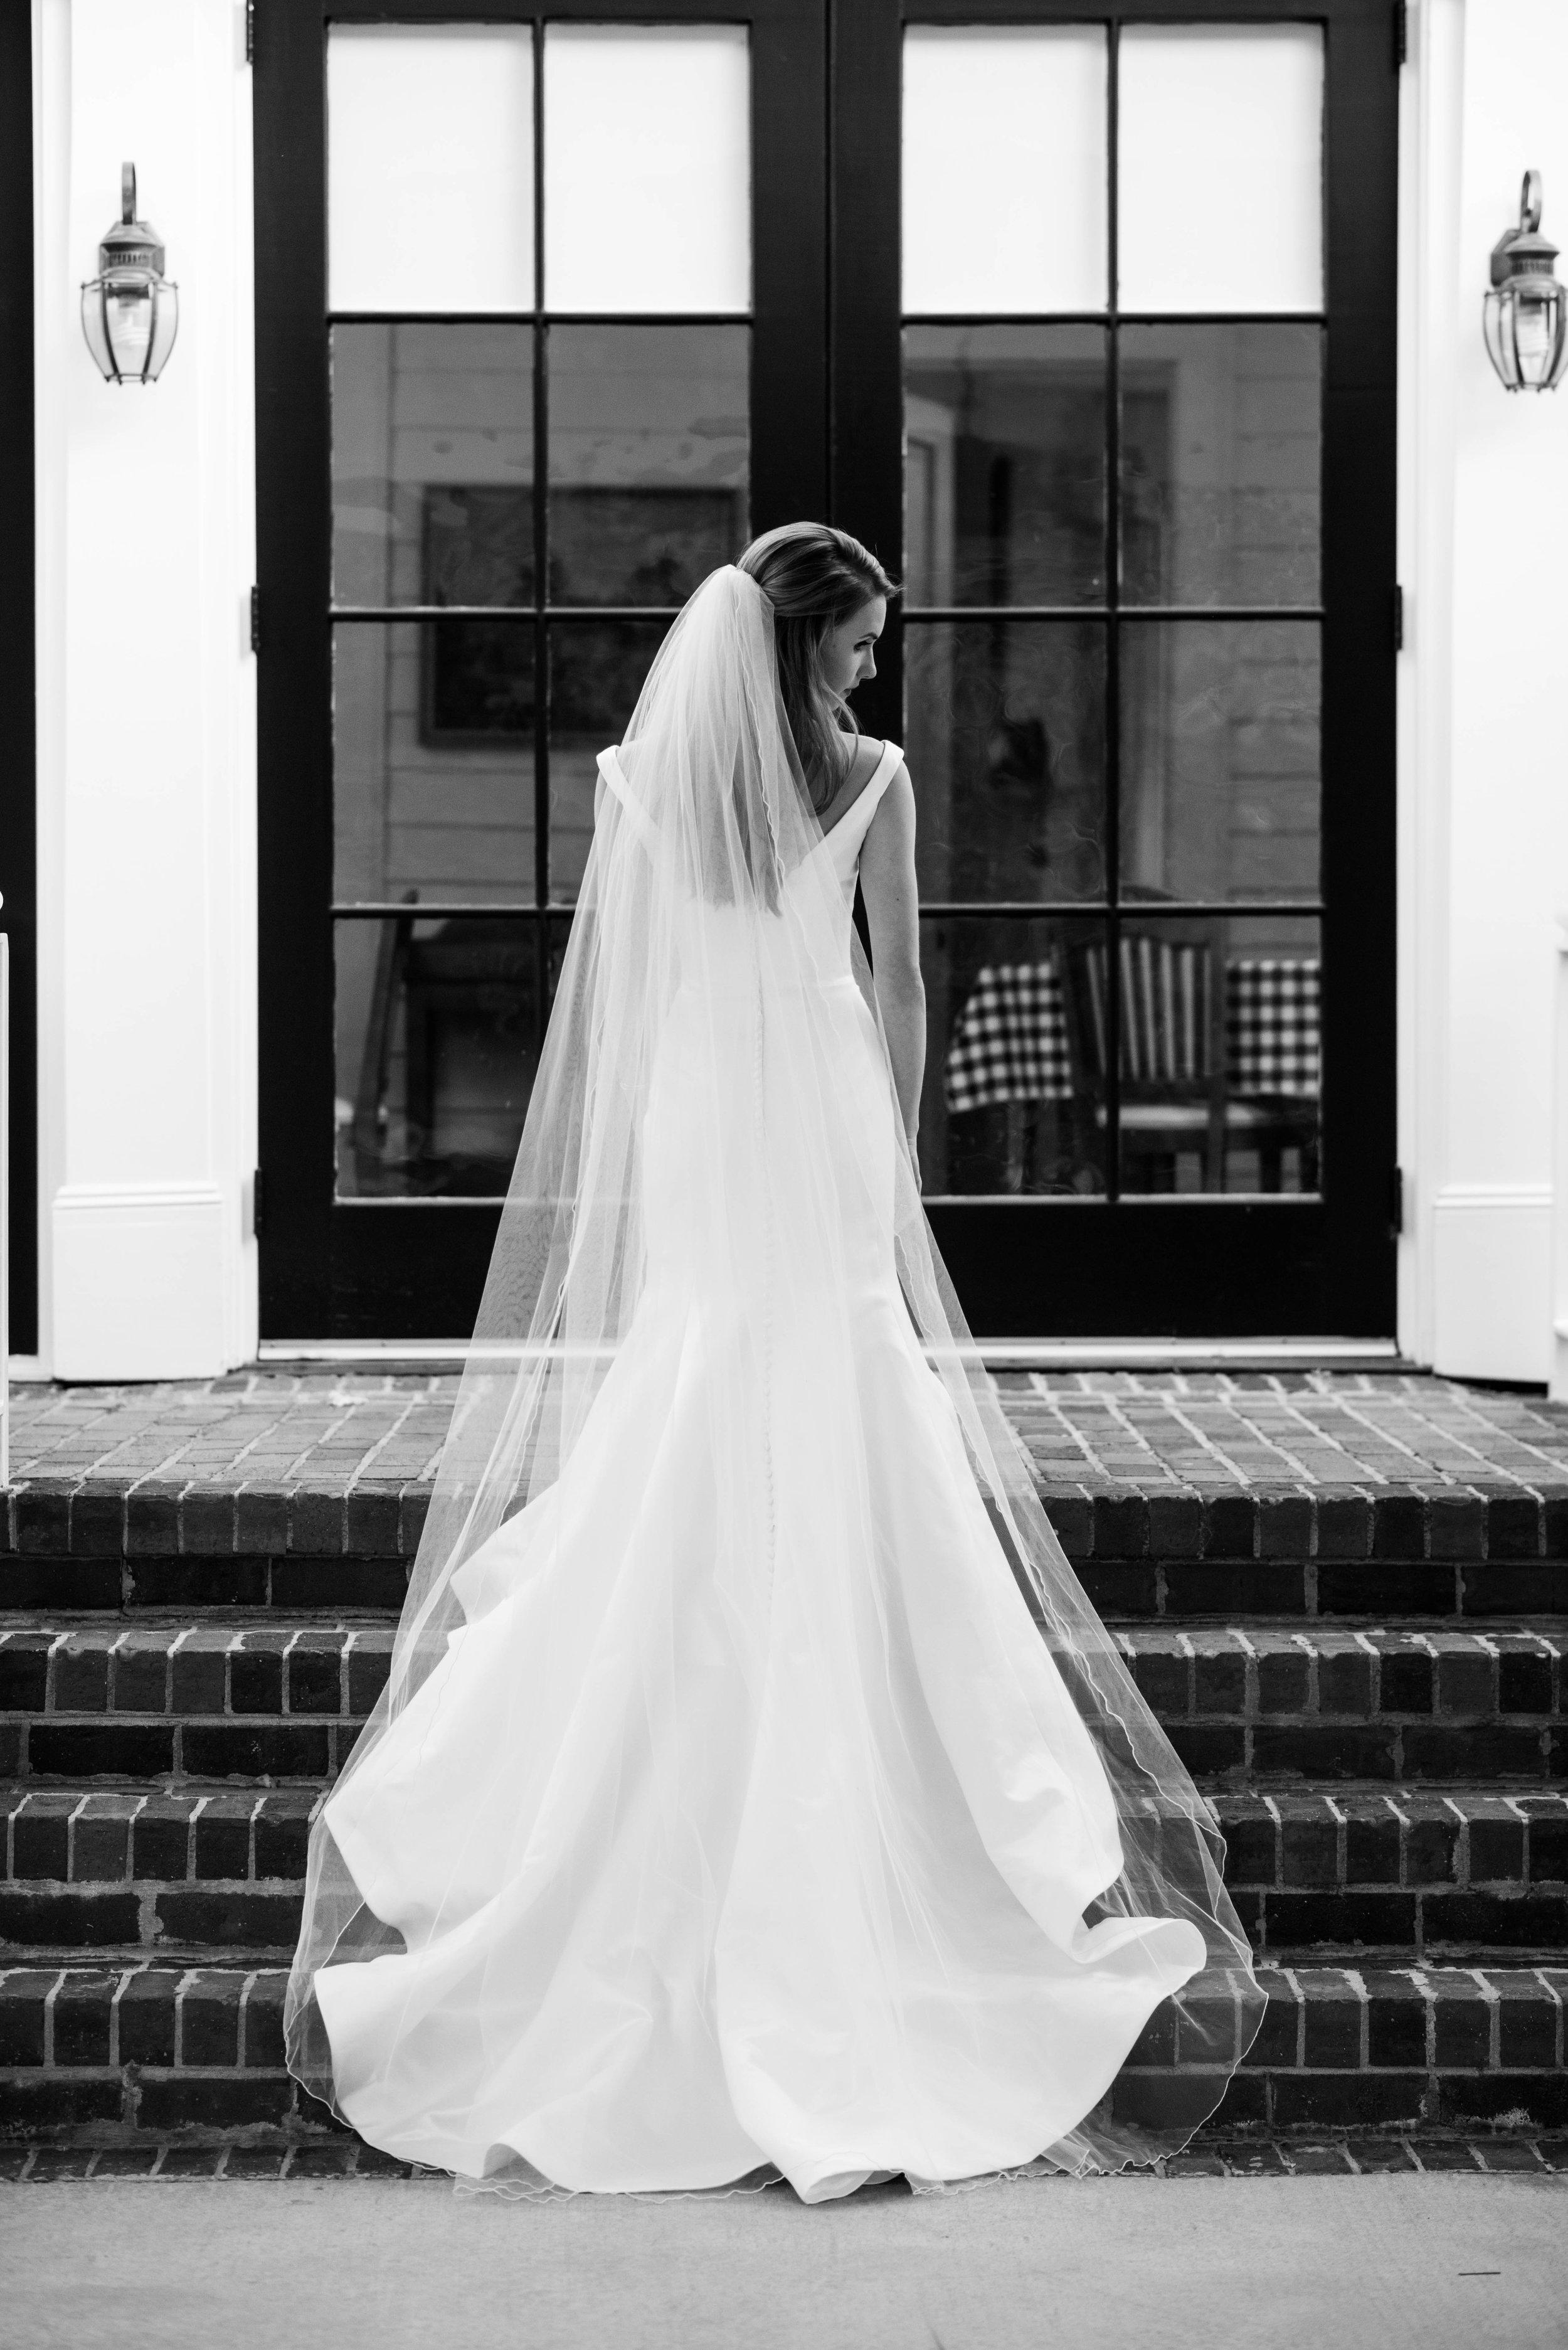 JuliaWilliams|Bridals|ZBW_MiraPhotographs-78.jpg